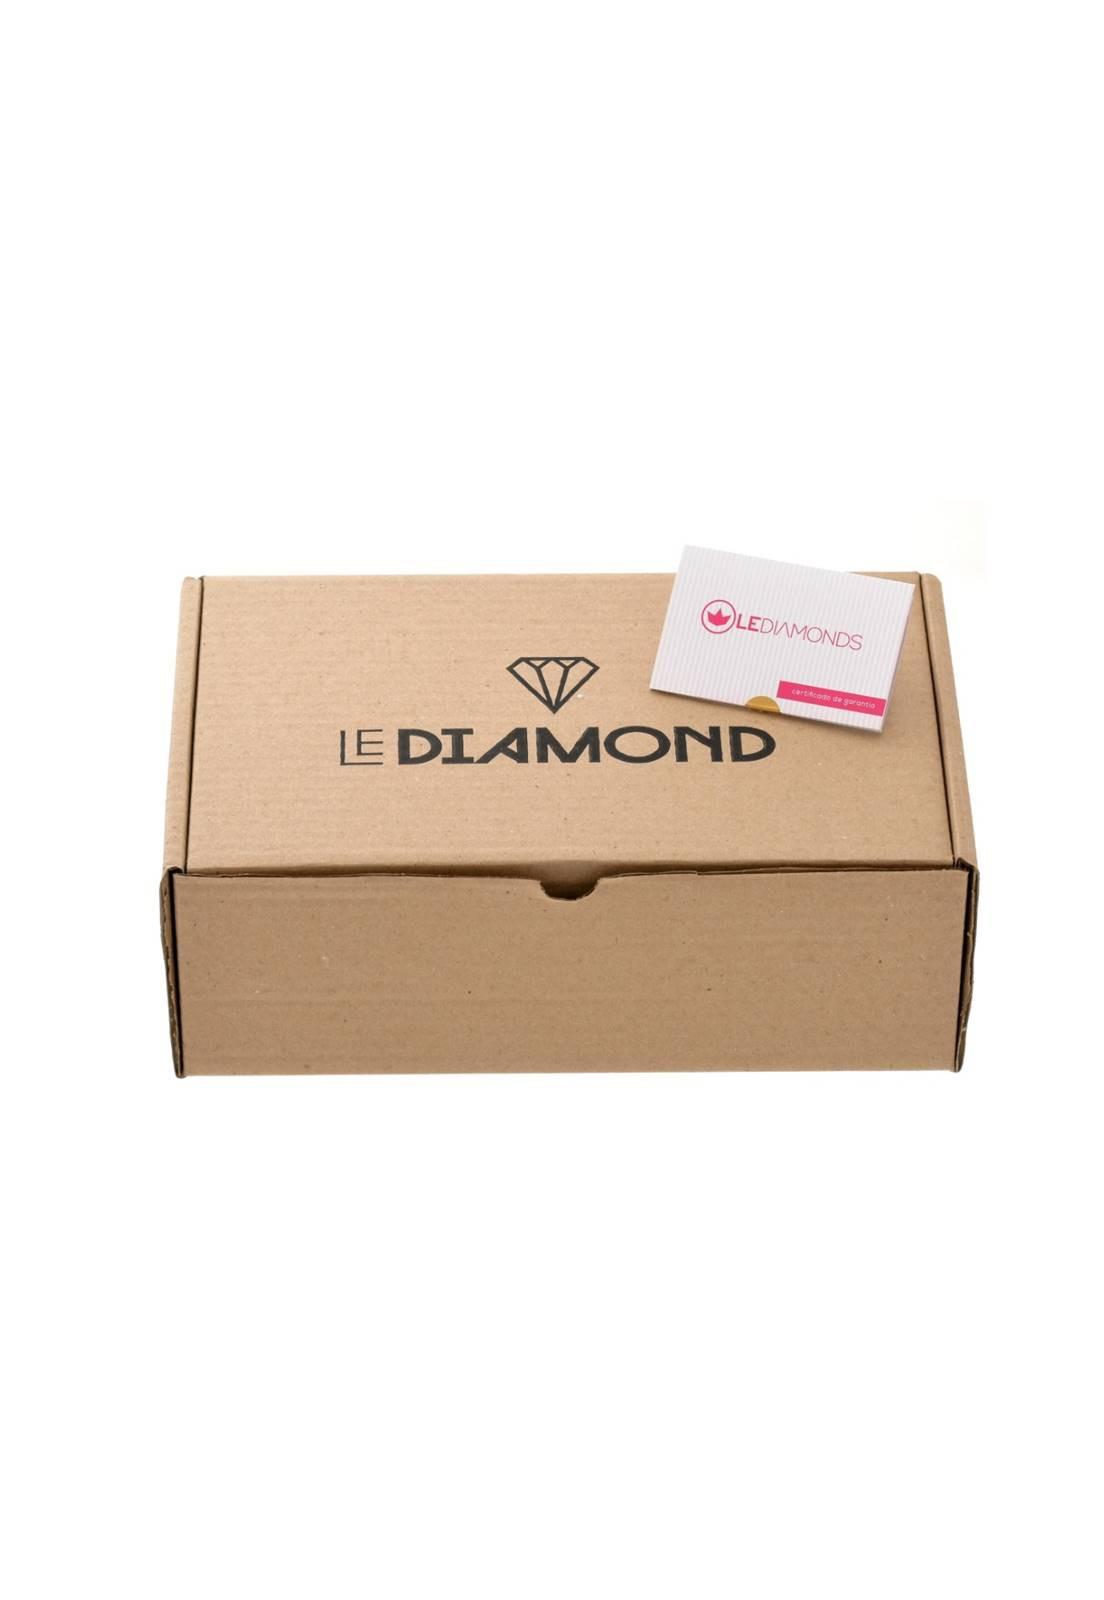 Tarraxa Le Diamond Sutiã de Orelha Dourada